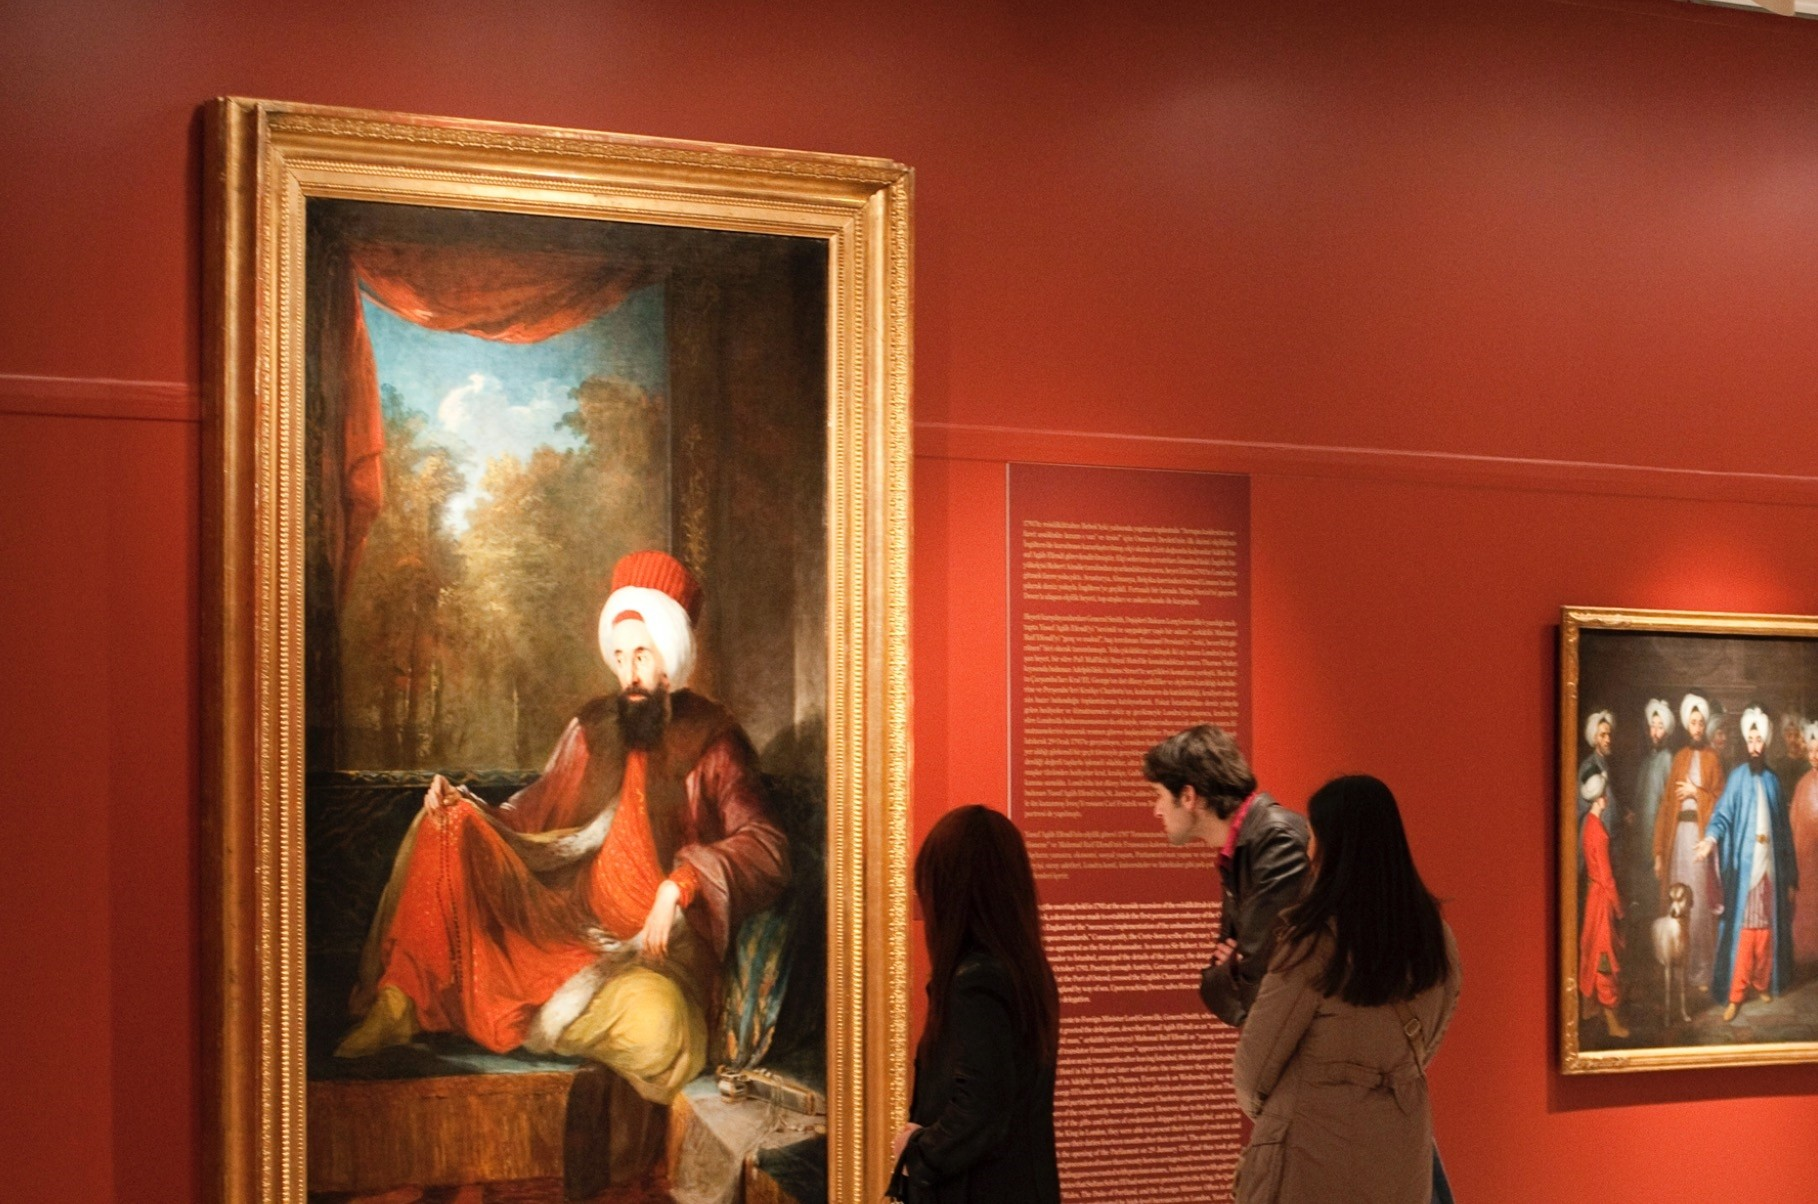 Visitors watching Pera Museumu2019s u201cIntersecting Worldsu201d collection.